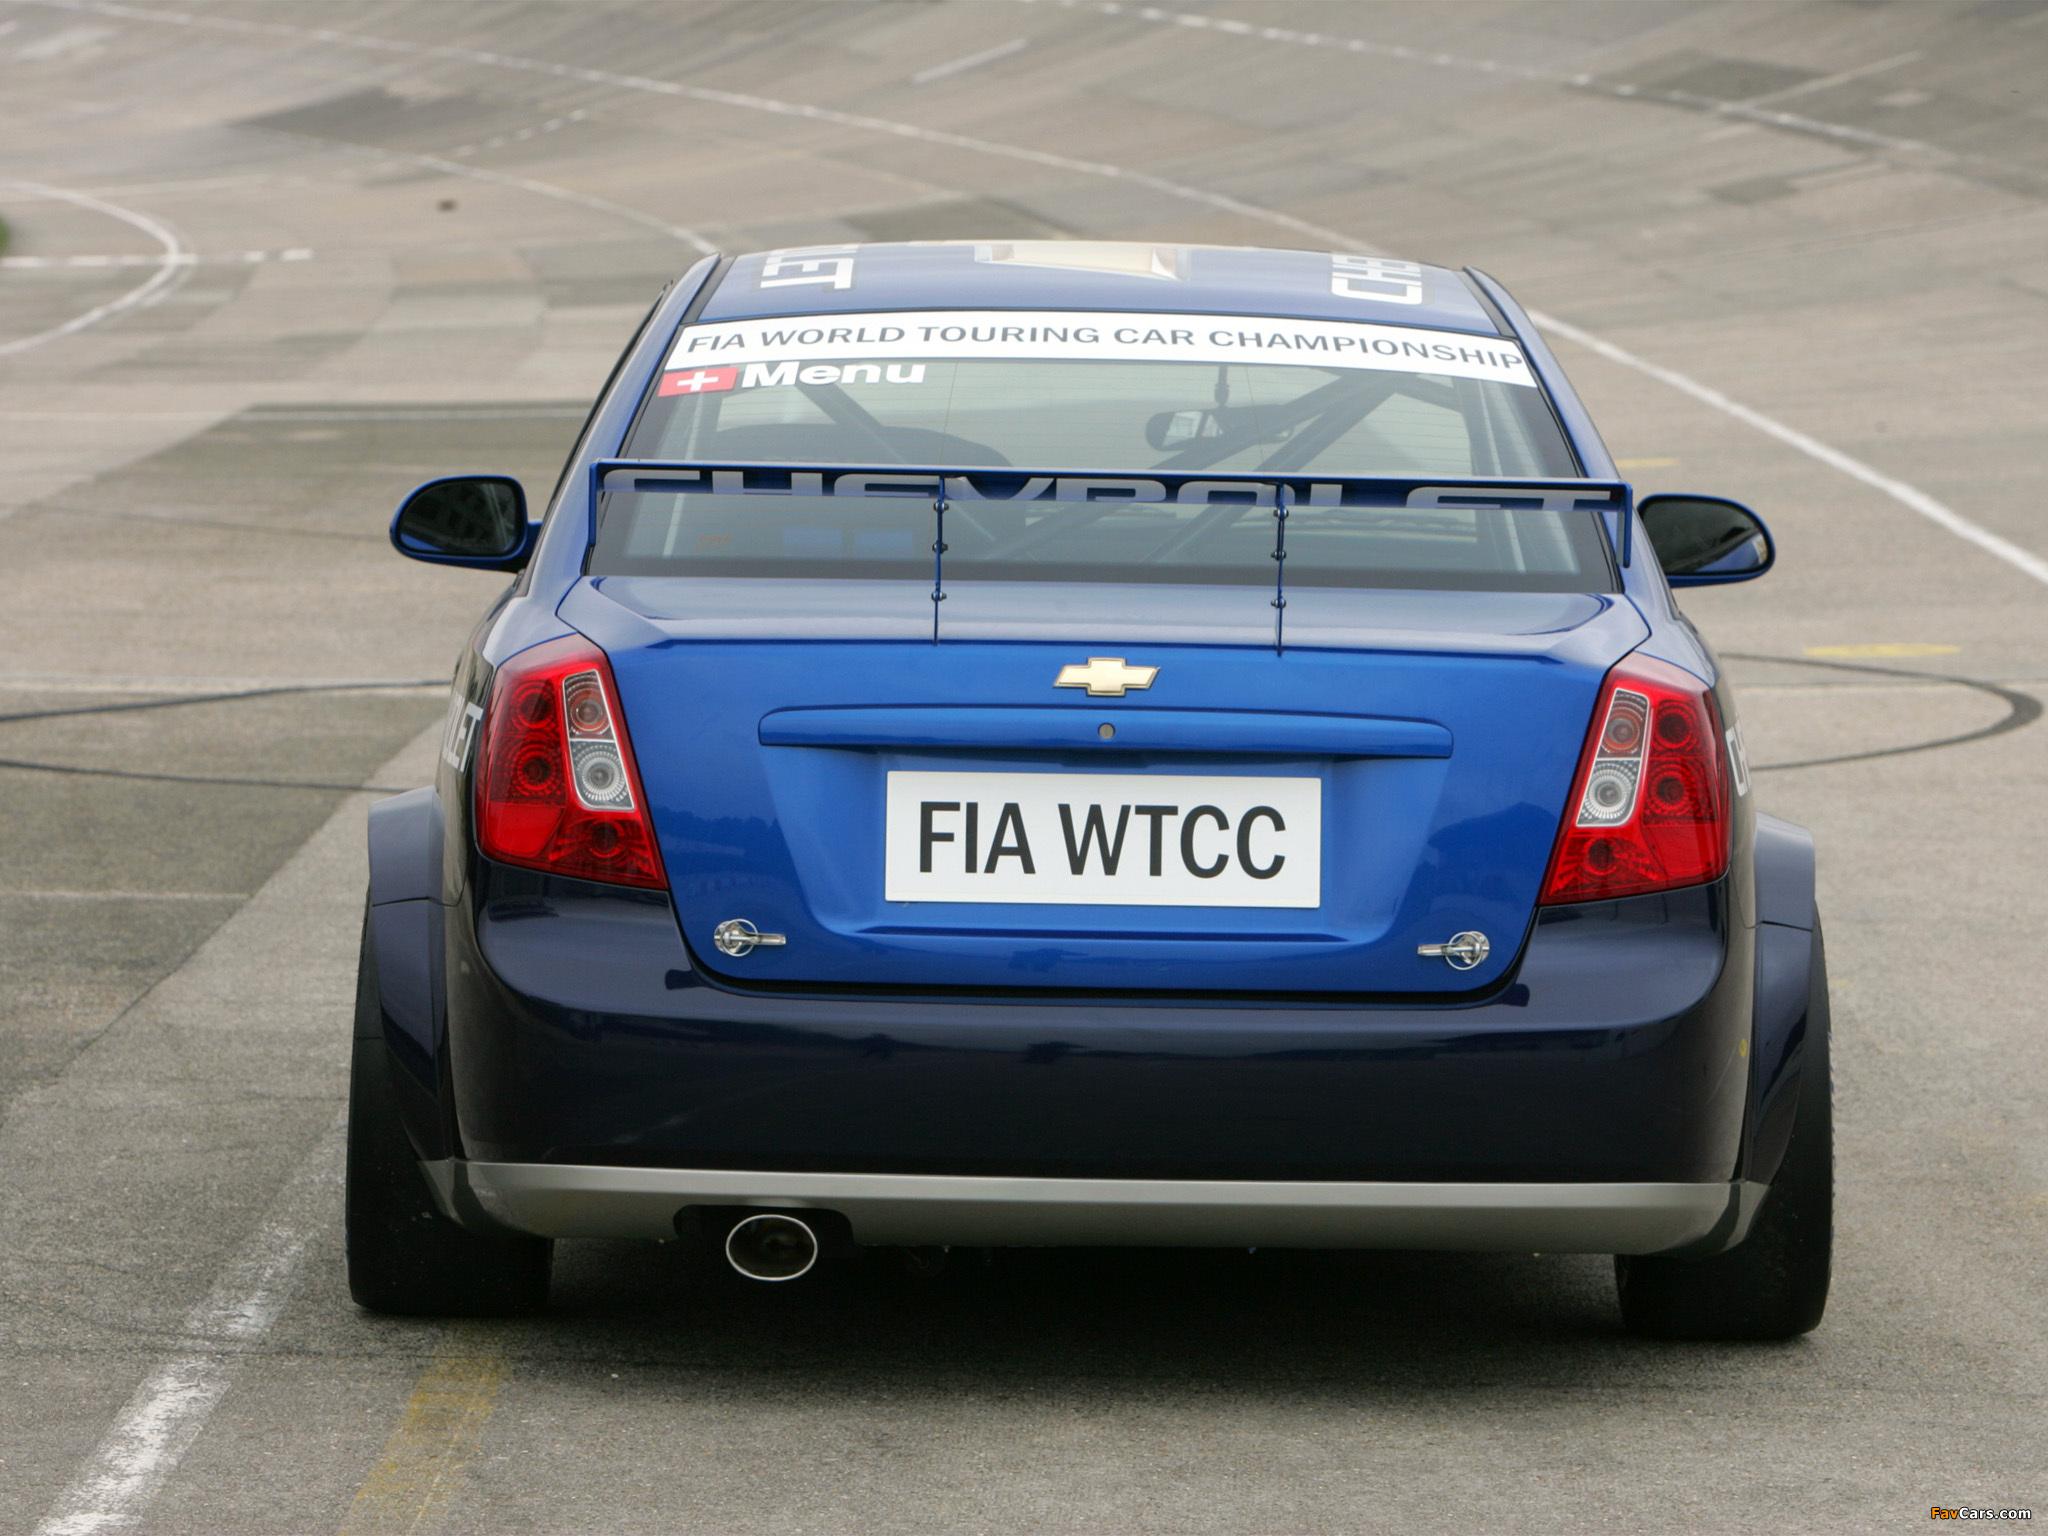 Chevrolet Lacetti WTCC 2005 pictures (2048 x 1536)